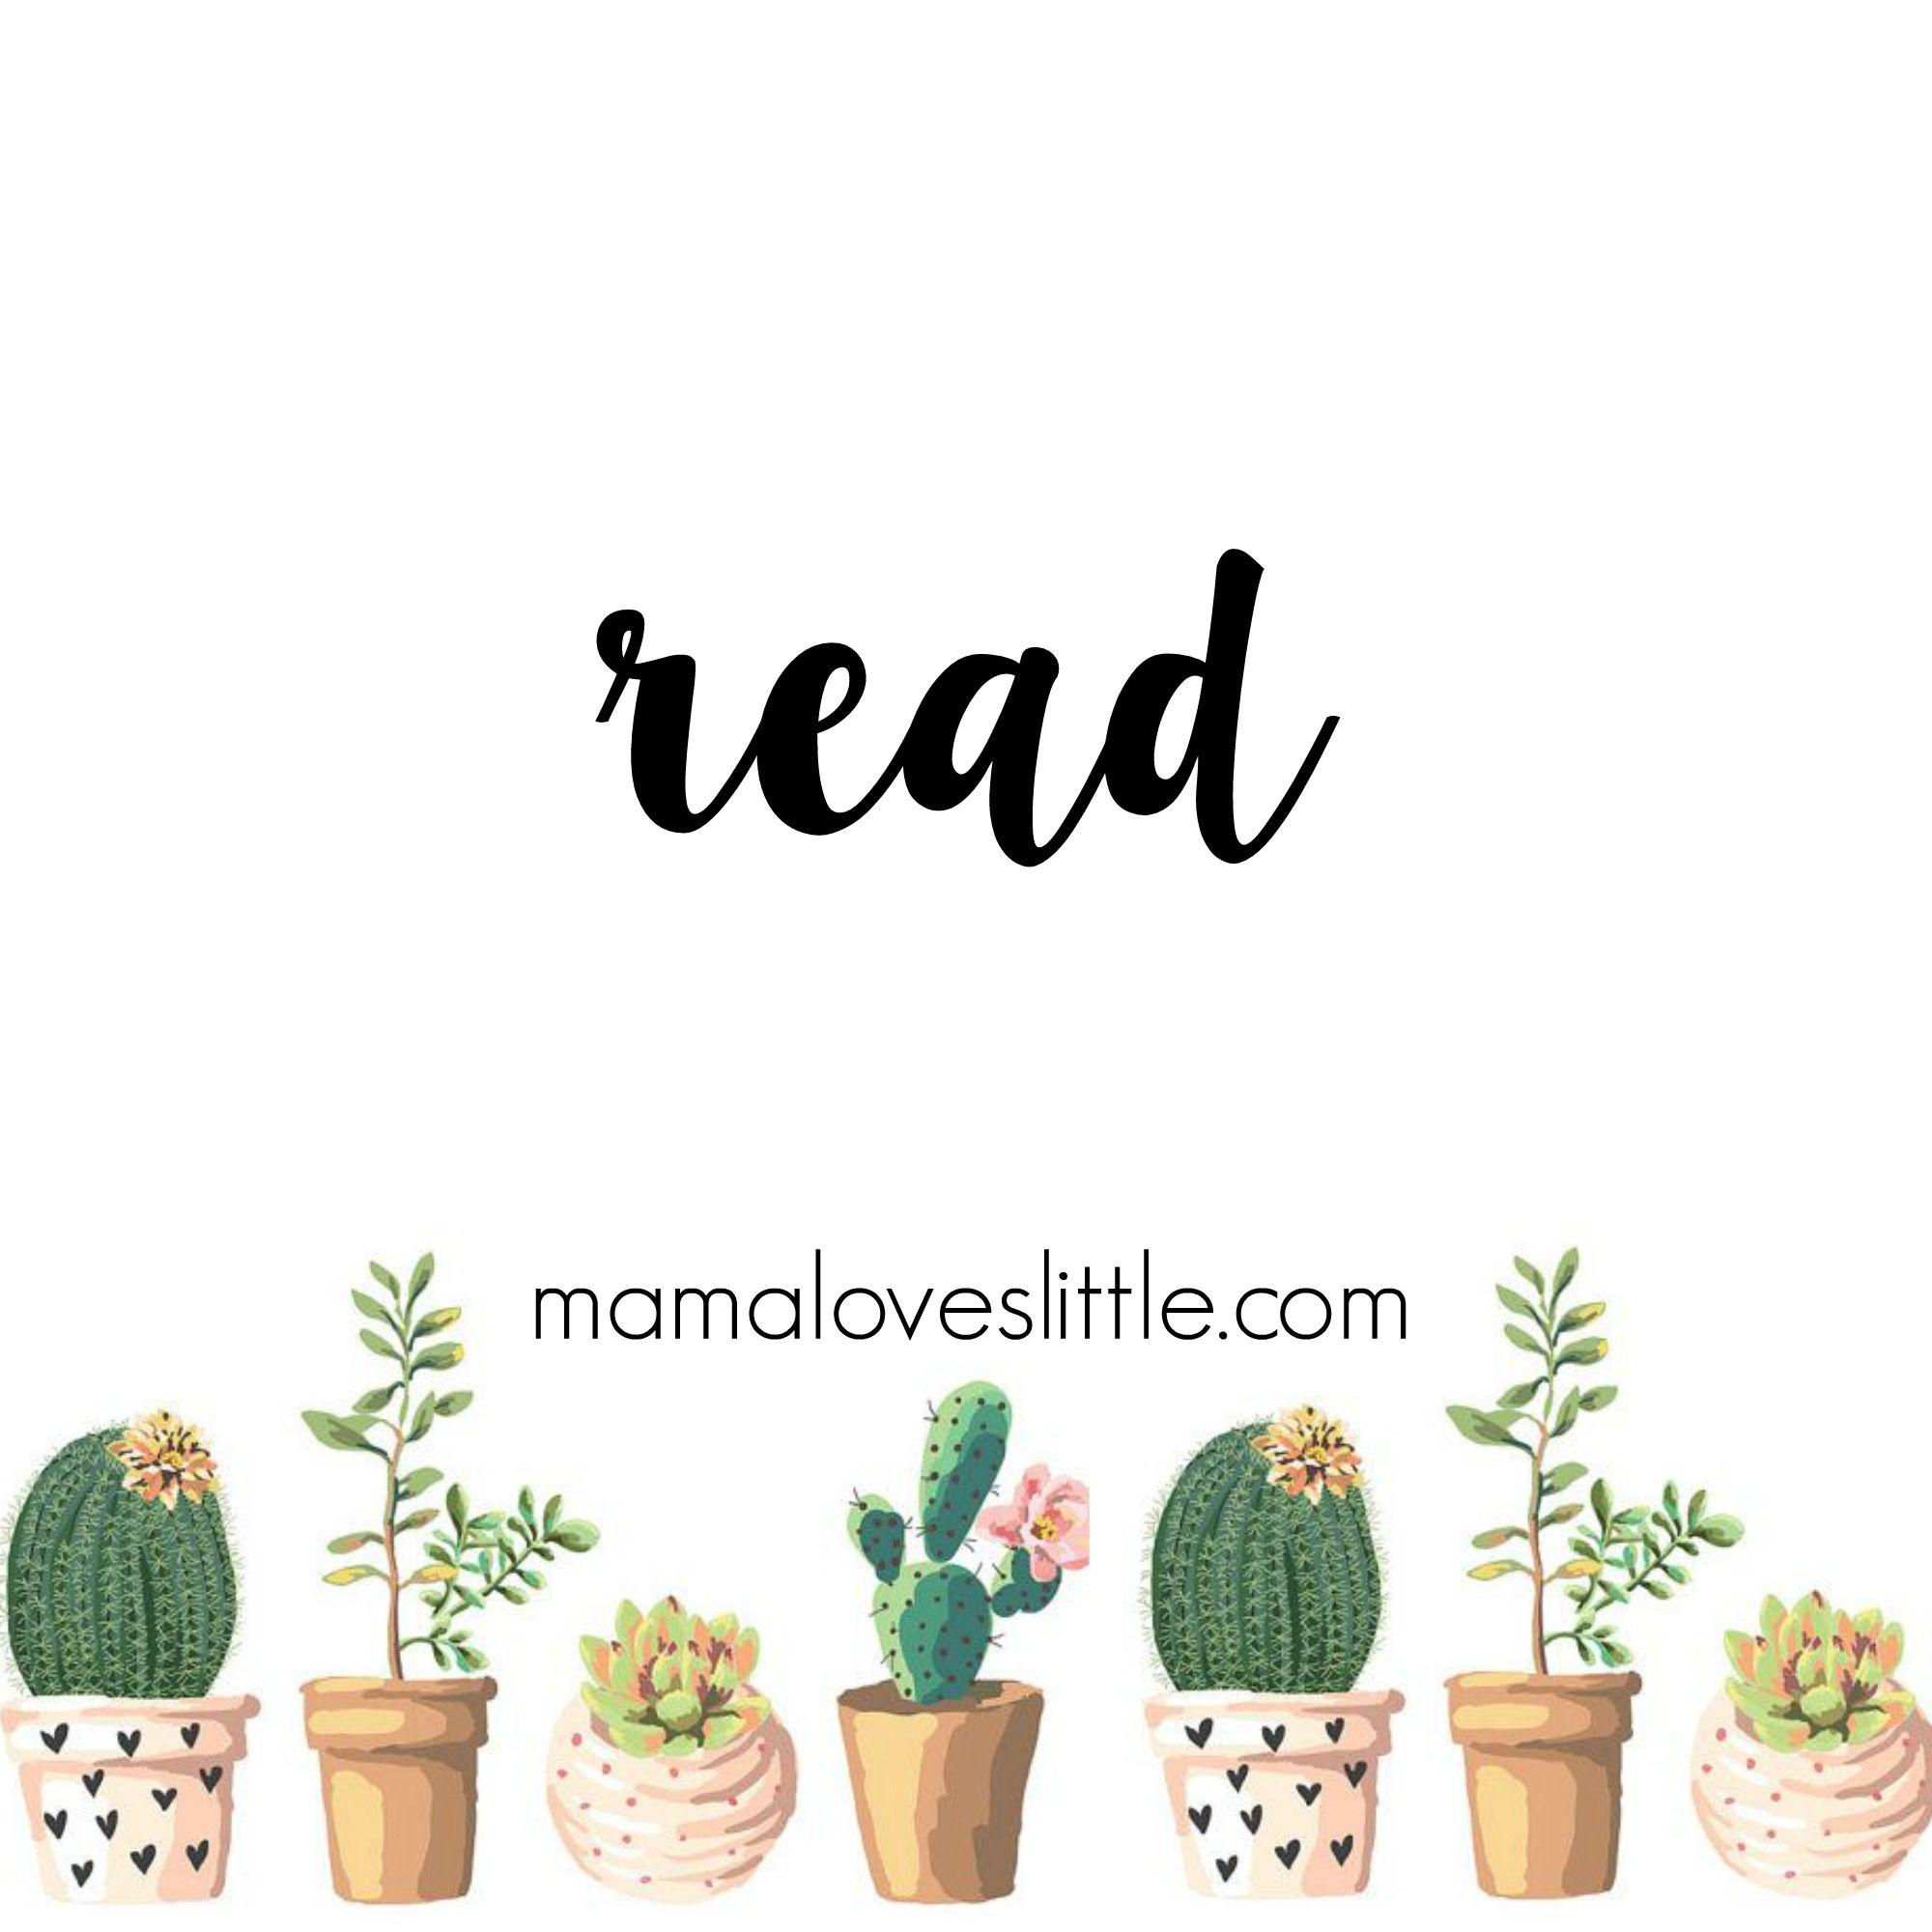 http://www.mamaloveslittle.com/